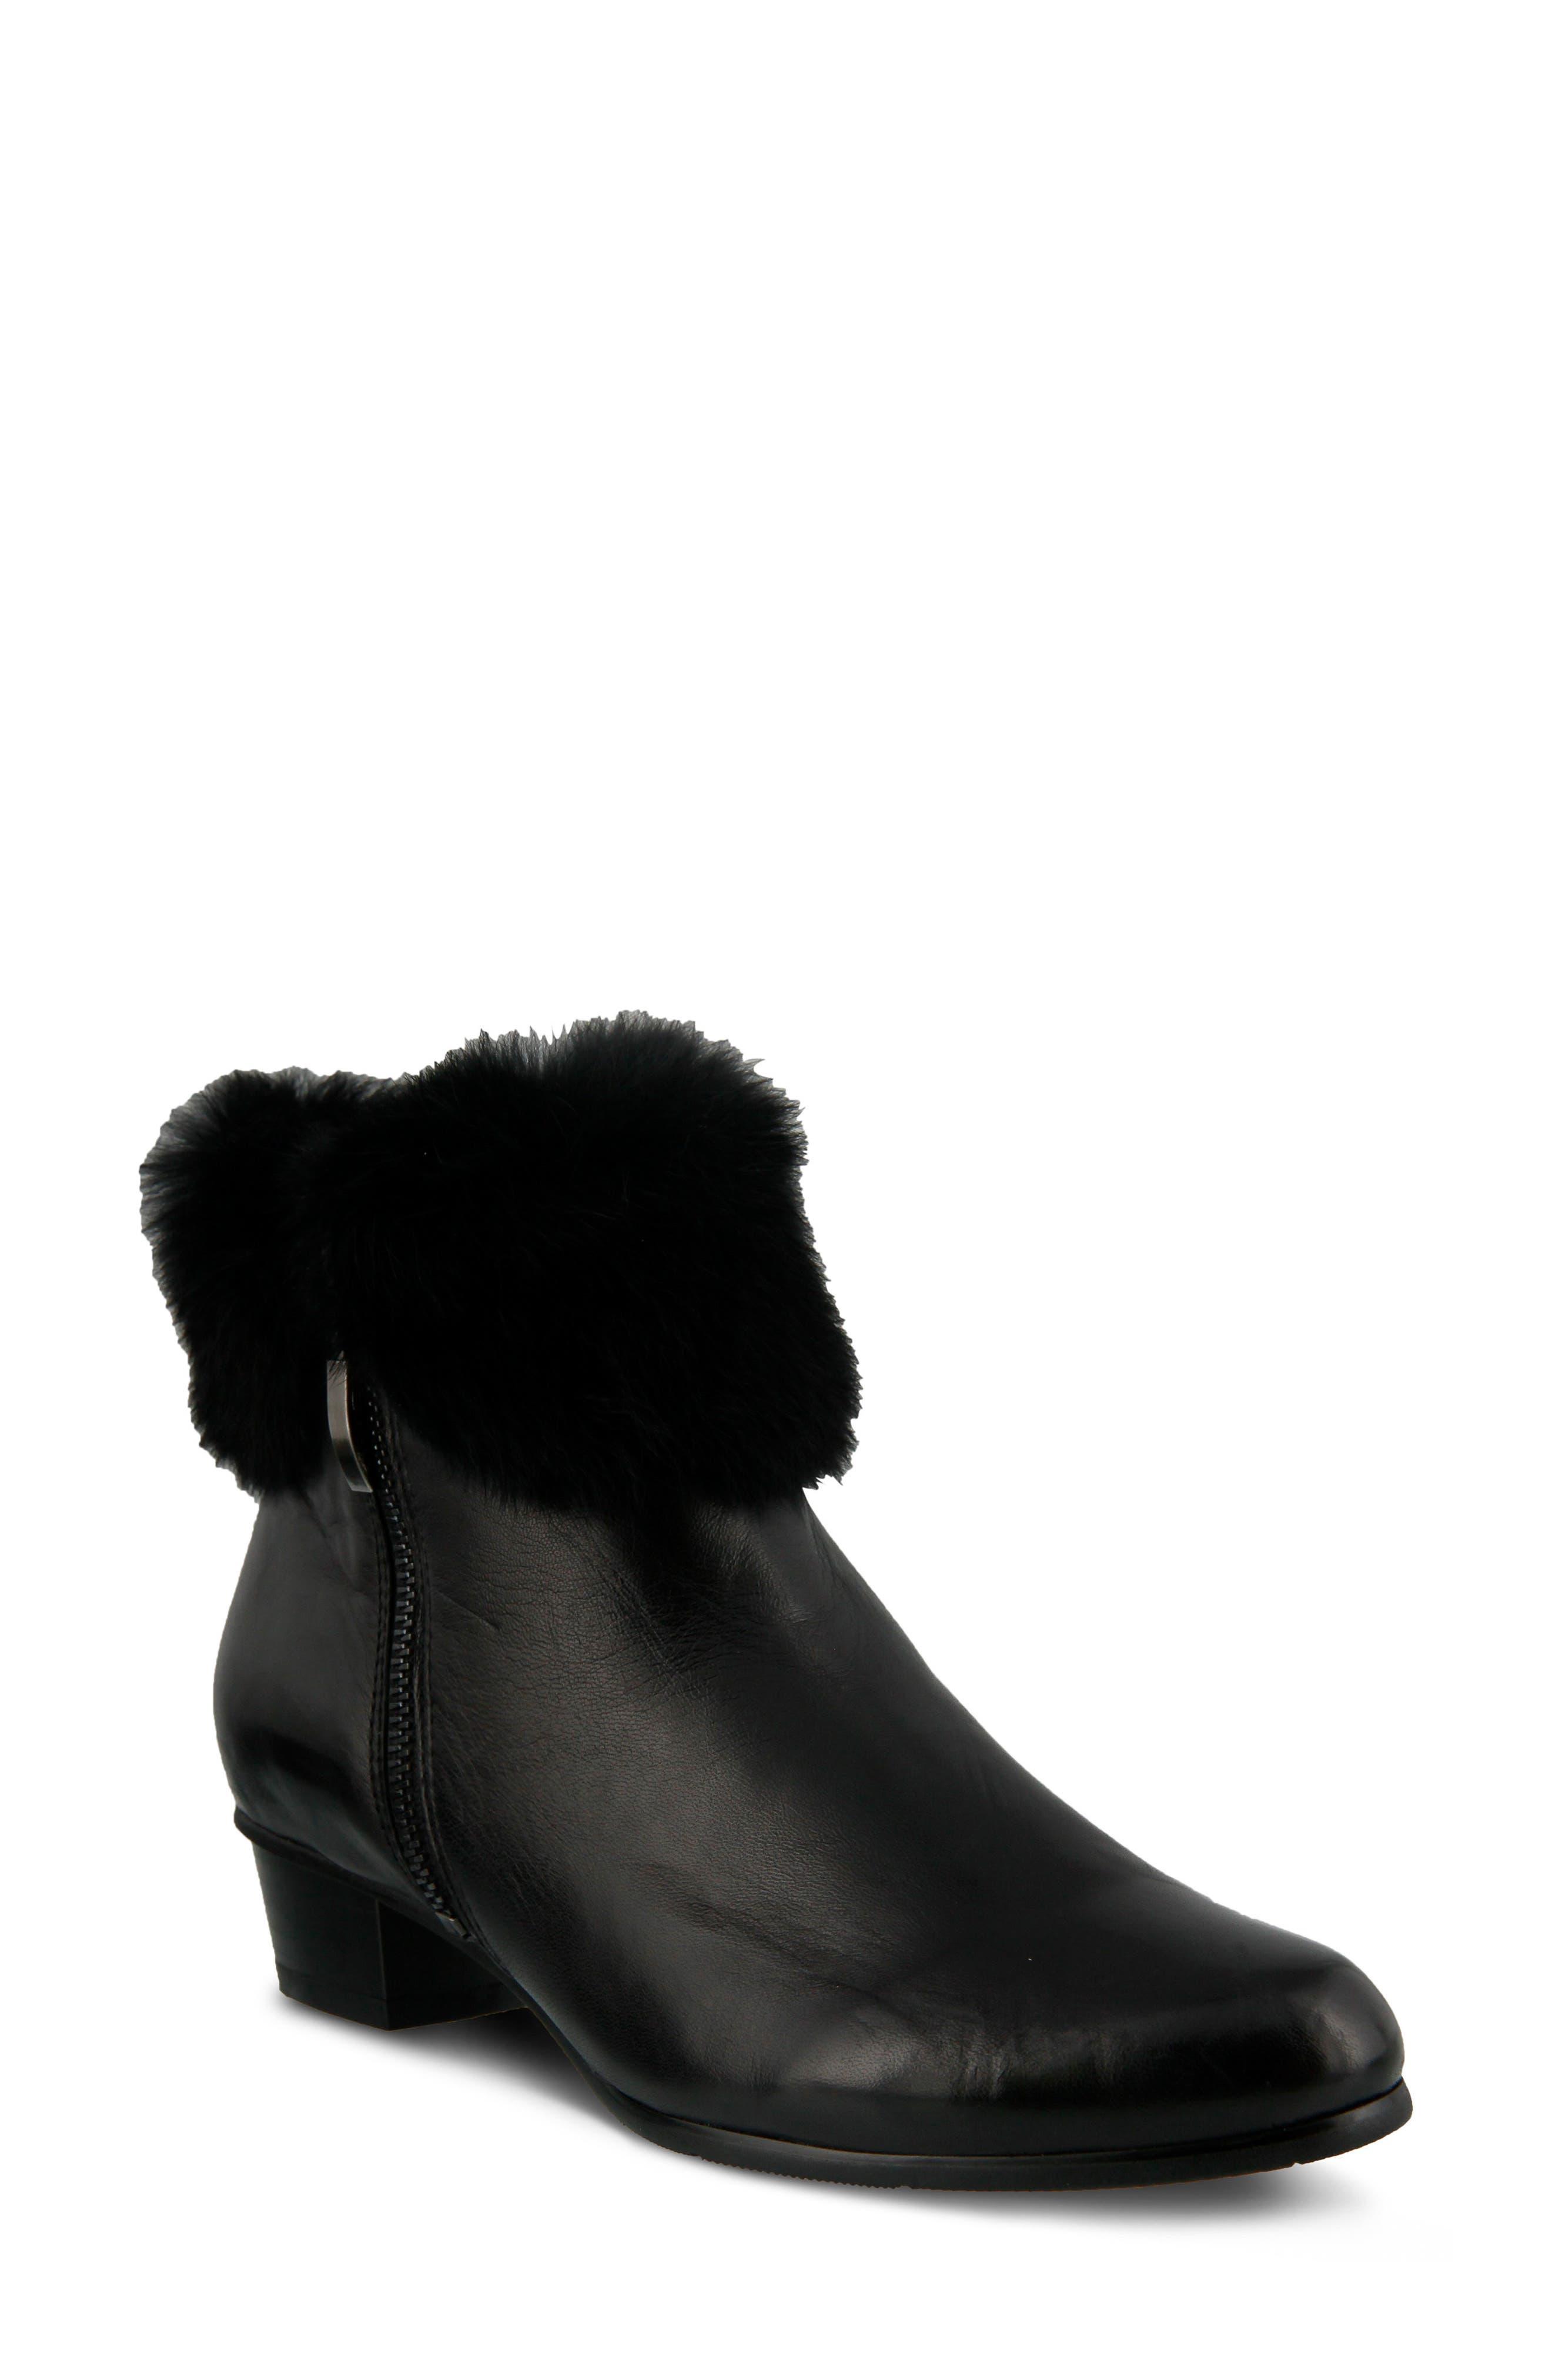 Spring Step Burnside Faux Fur Trim Bootie - Black